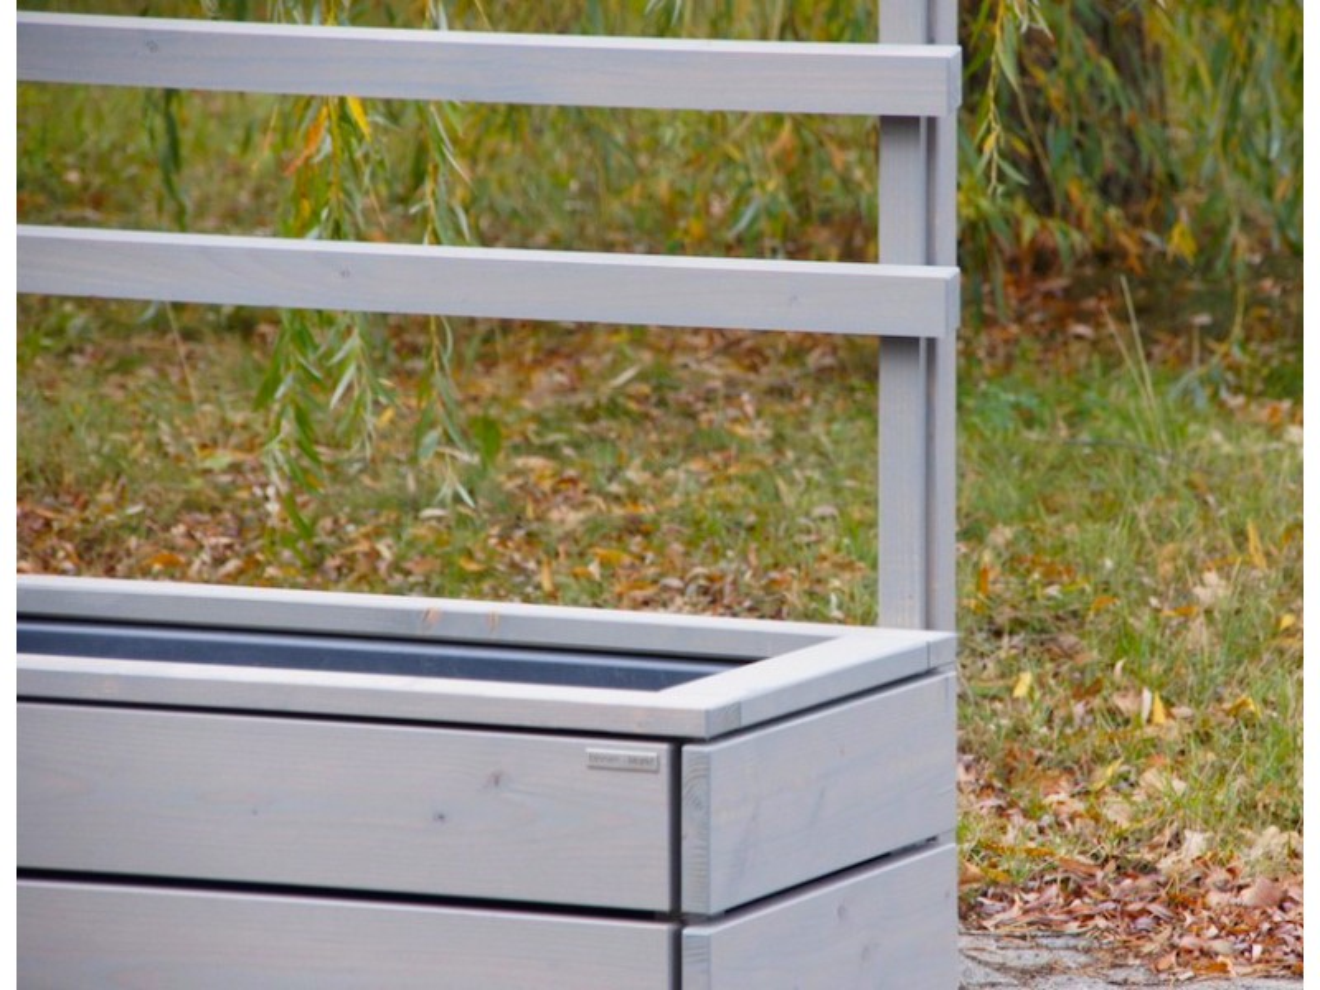 pflanzkasten mit rankgitter heimisches holz made in germany. Black Bedroom Furniture Sets. Home Design Ideas